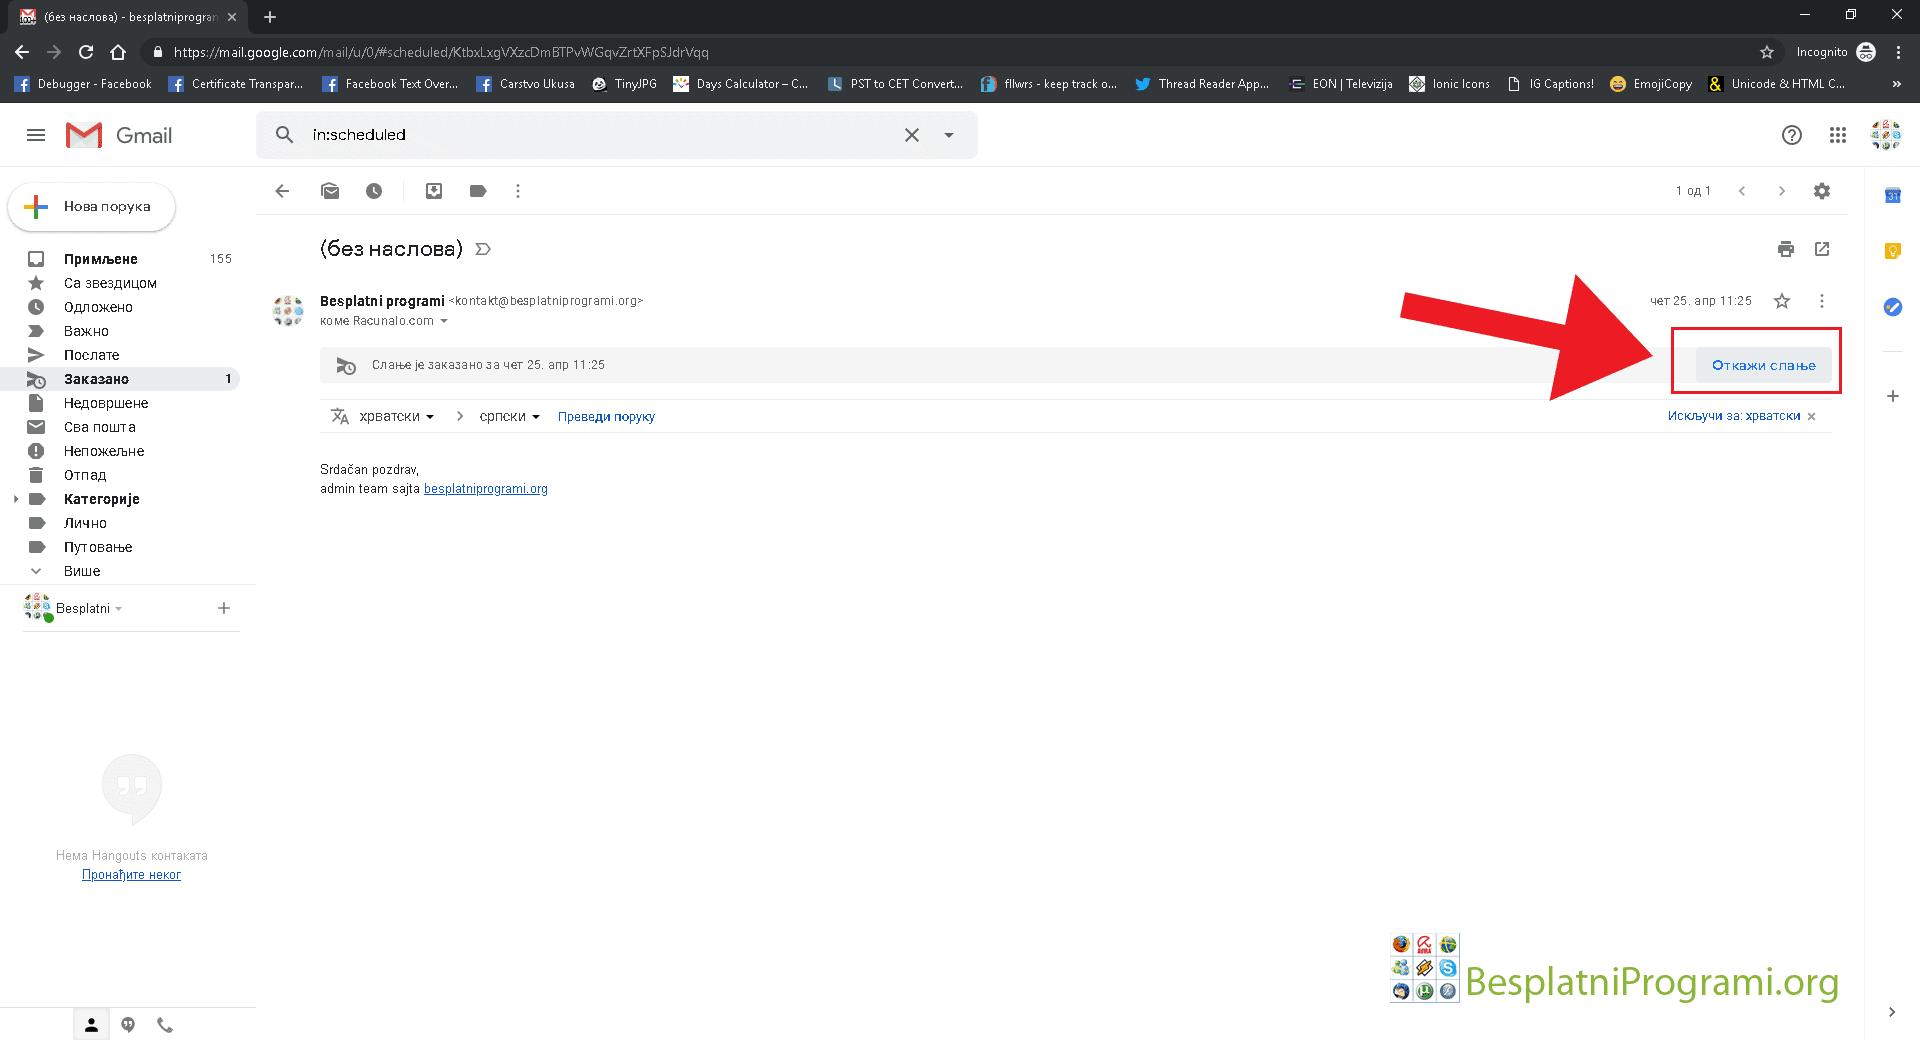 Gmail laptop - desktop zakaži slanje mejla otkaži